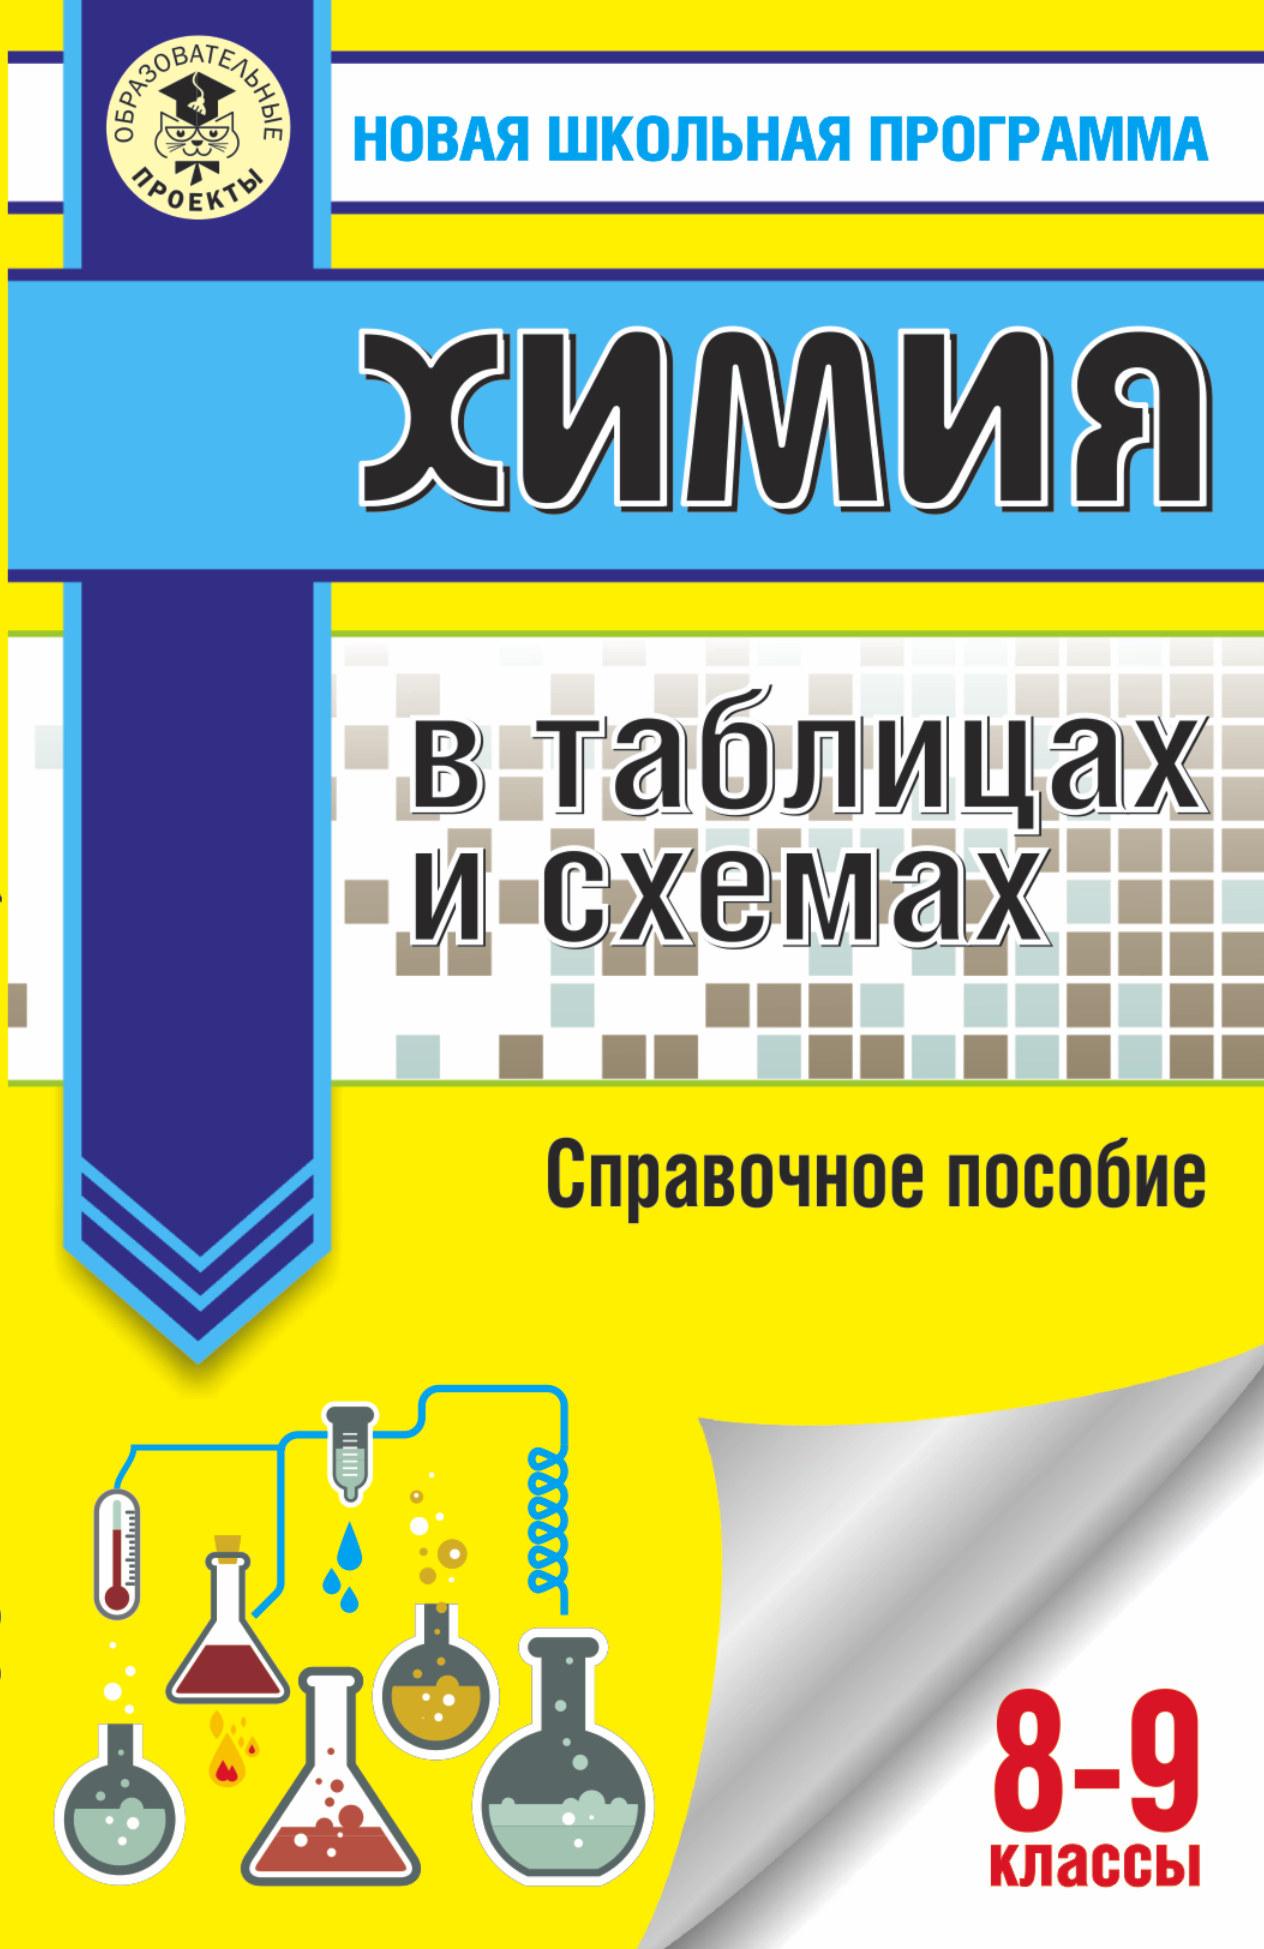 Савинкина Е.В., Логинова Г.П. Химия в таблицах и схемах. 8-9 классы